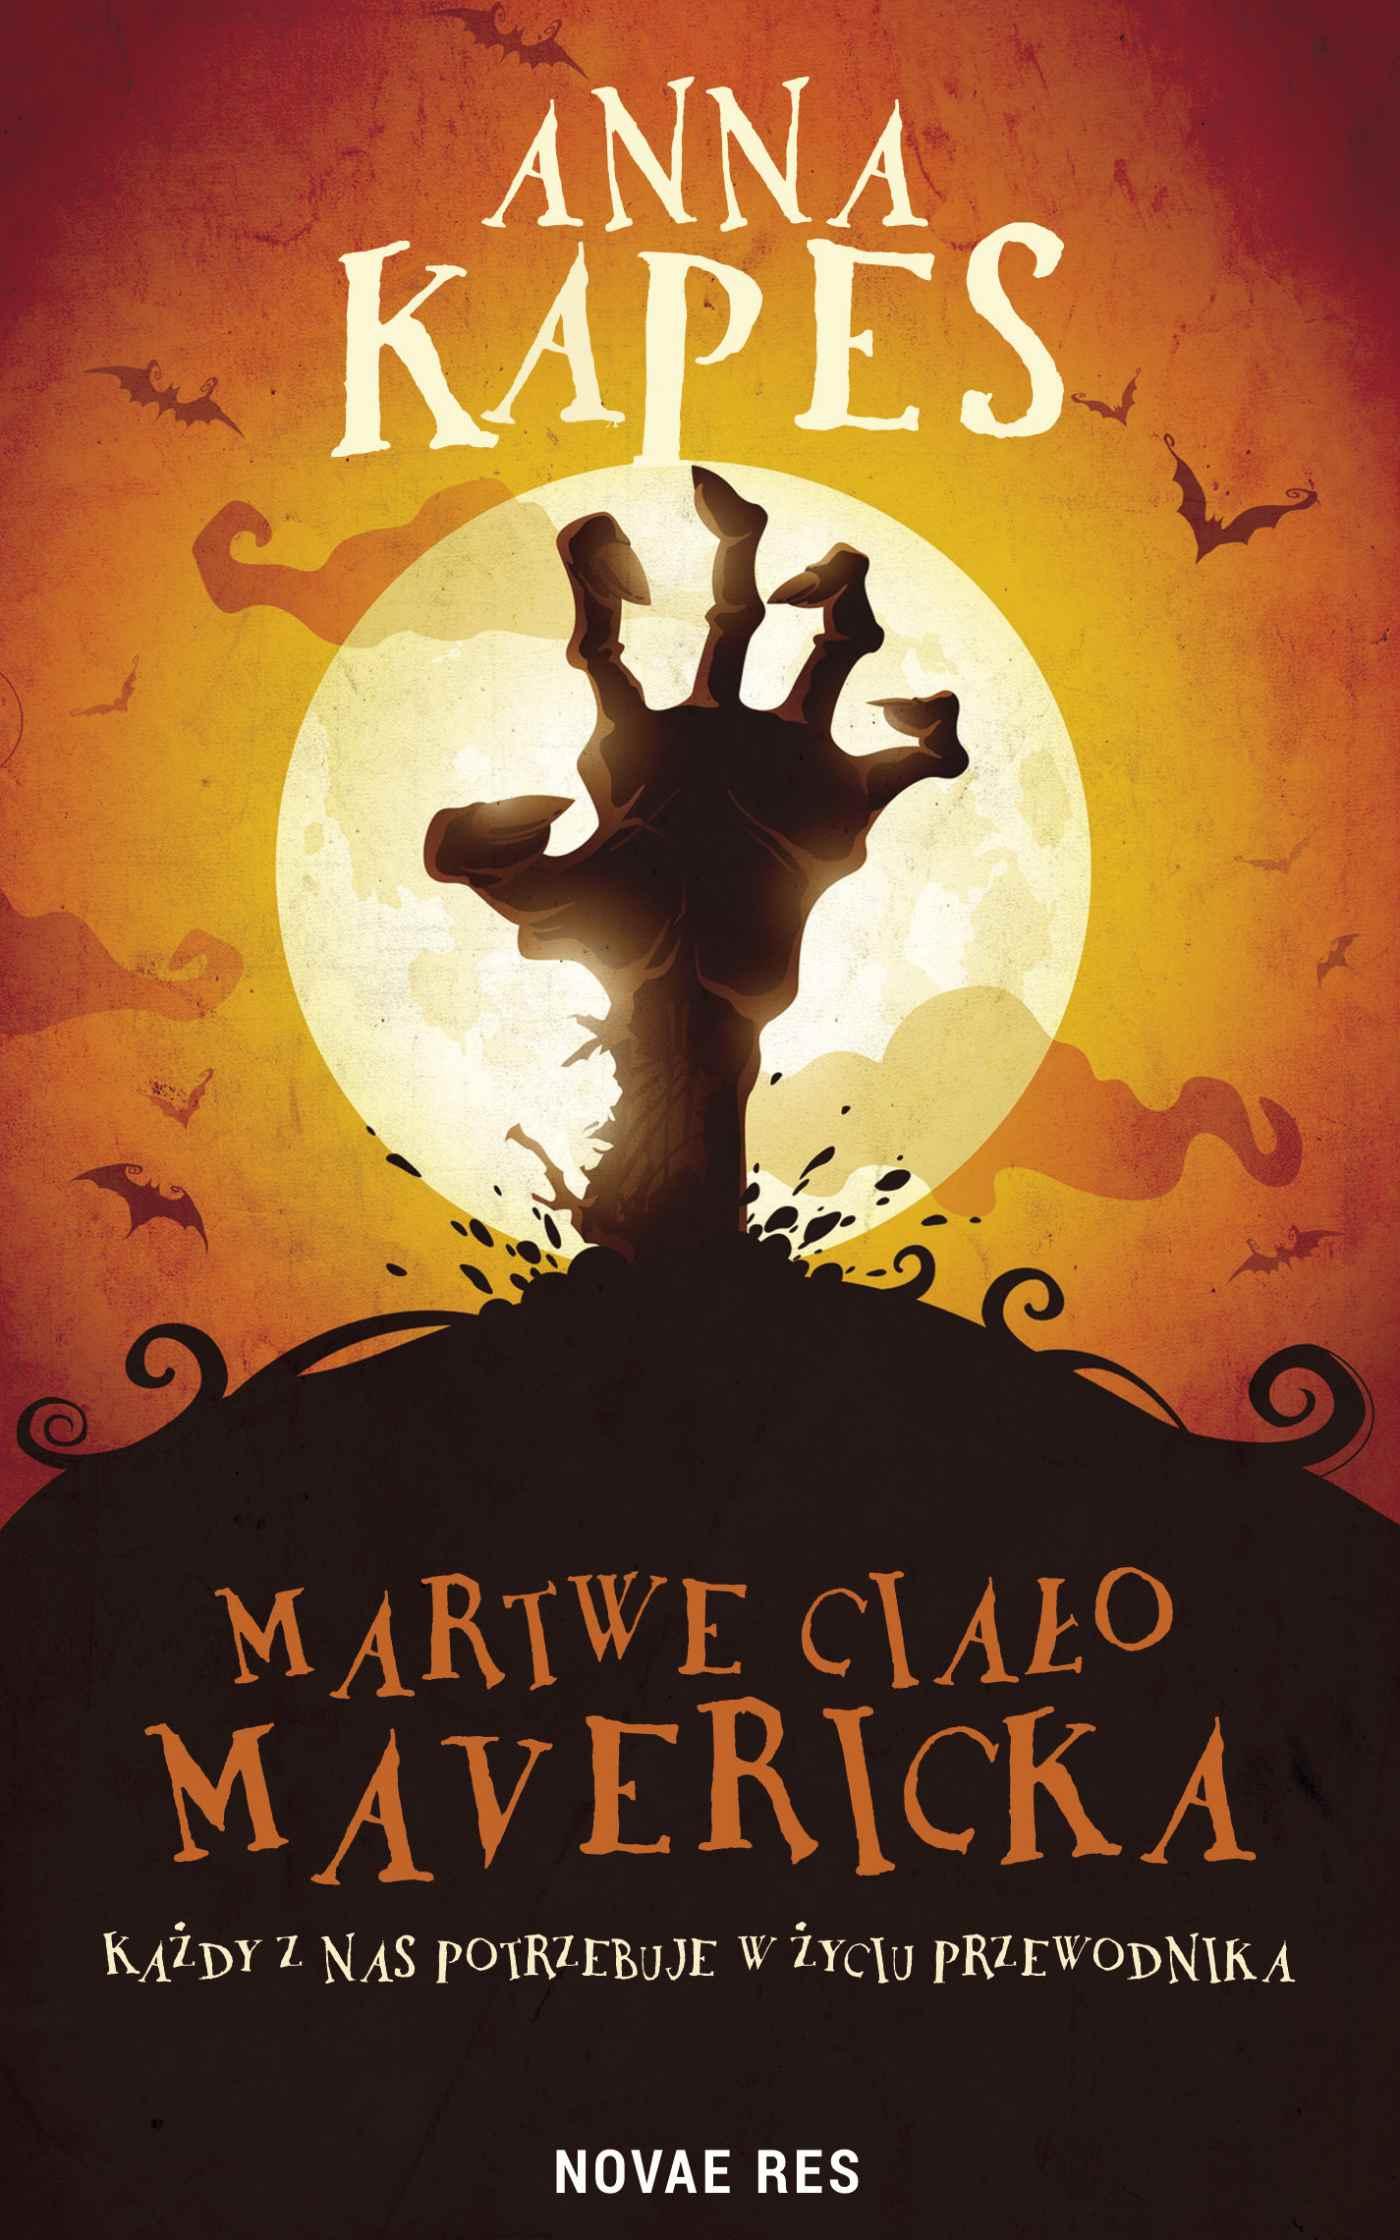 Martwe ciało Mavericka - Ebook (Książka na Kindle) do pobrania w formacie MOBI